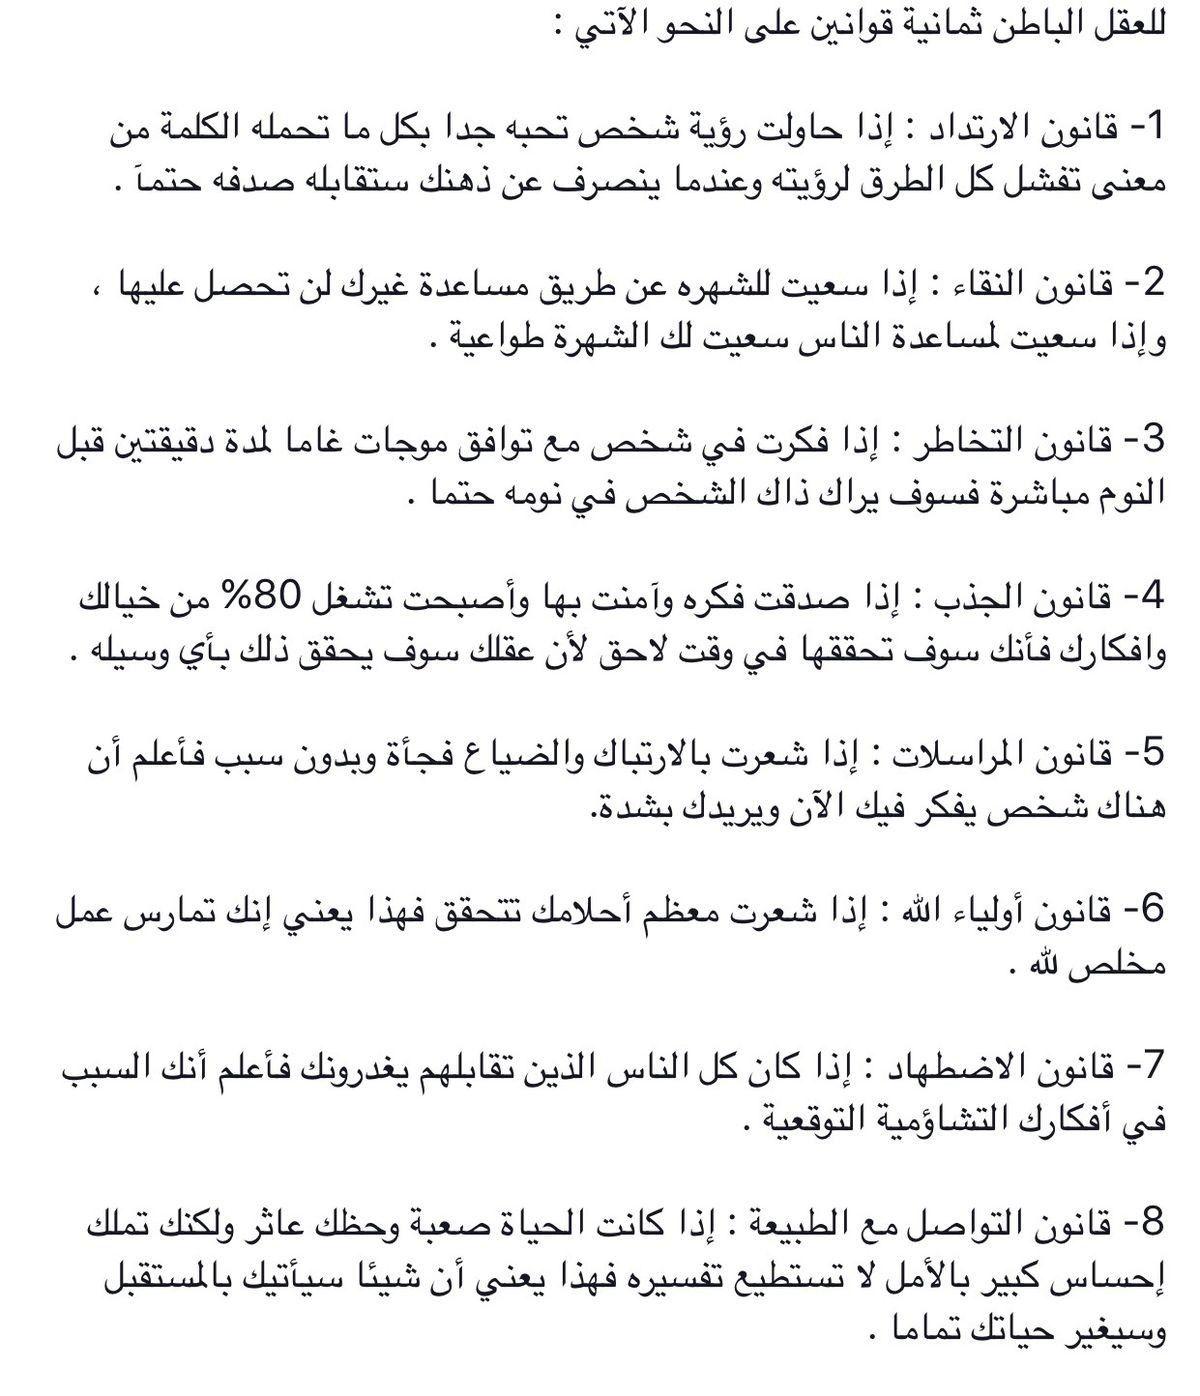 Pin By Hanane On تنمية بشرية Wisdom Quotes Life Psychology Quotes Arabic Quotes